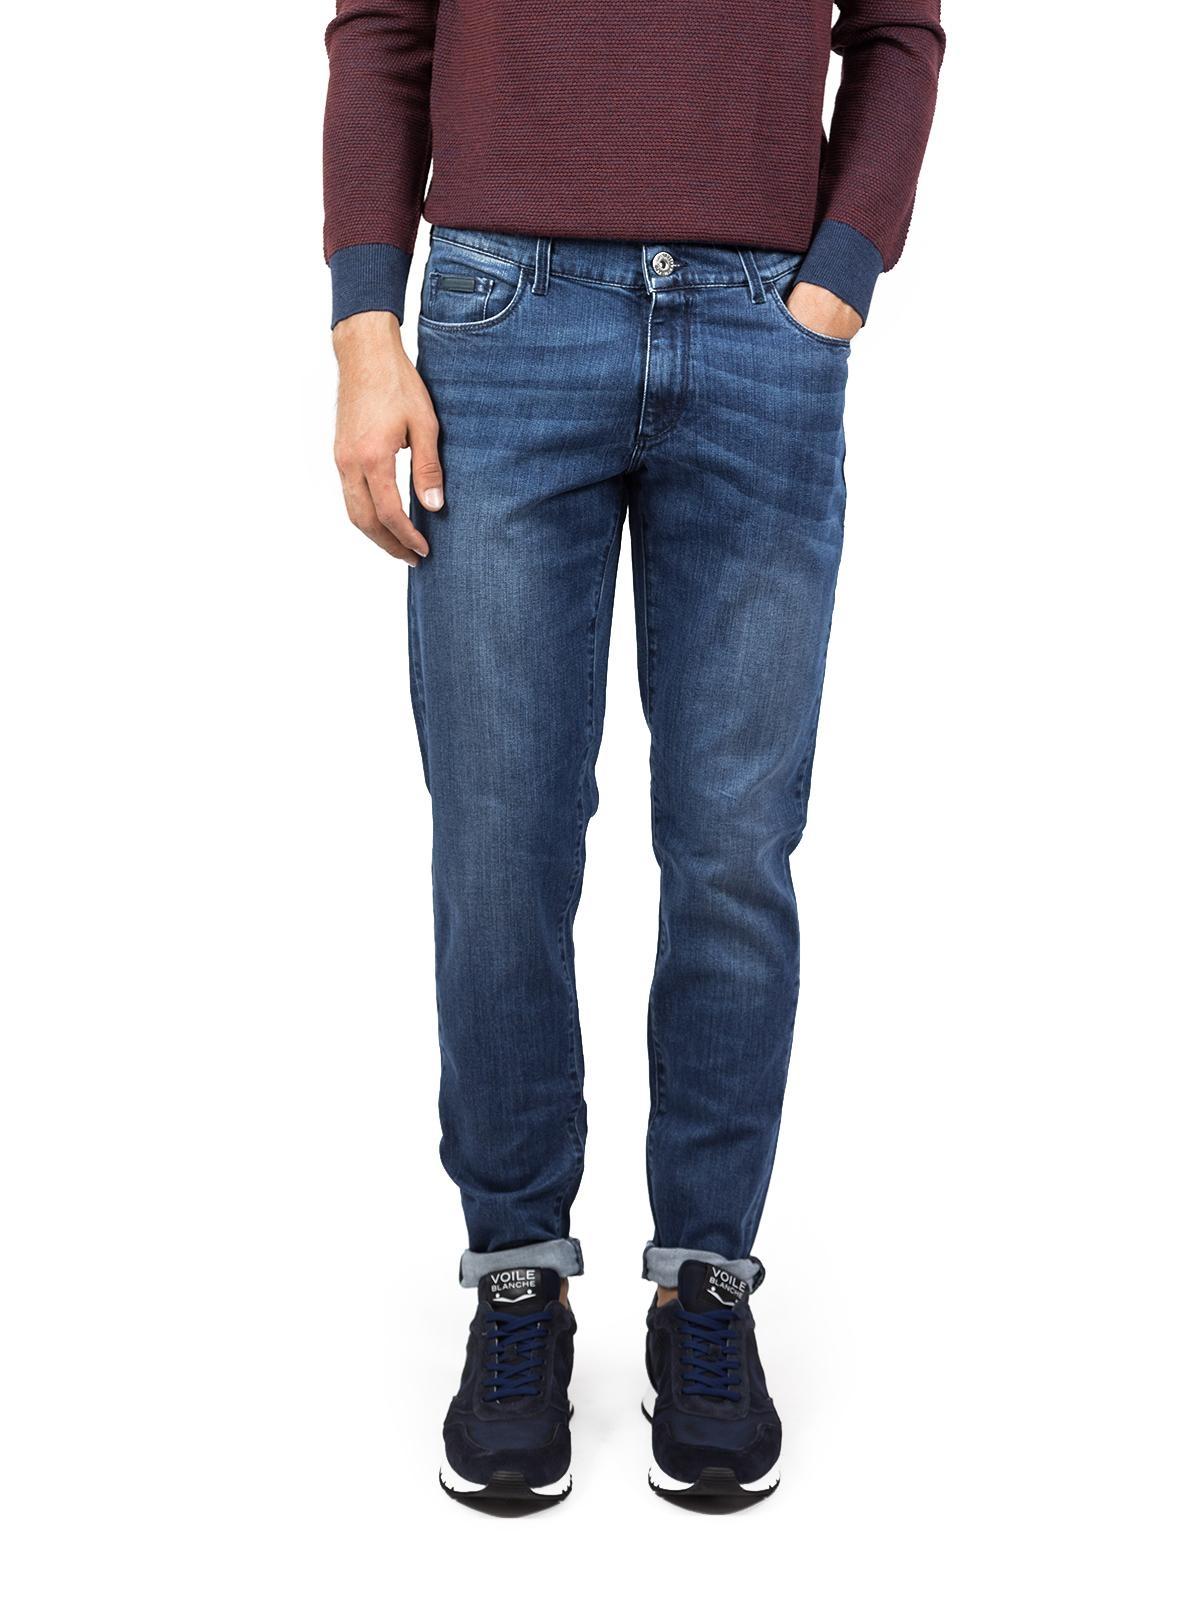 Trussardi - Jeans - 52J00025 1Y091289